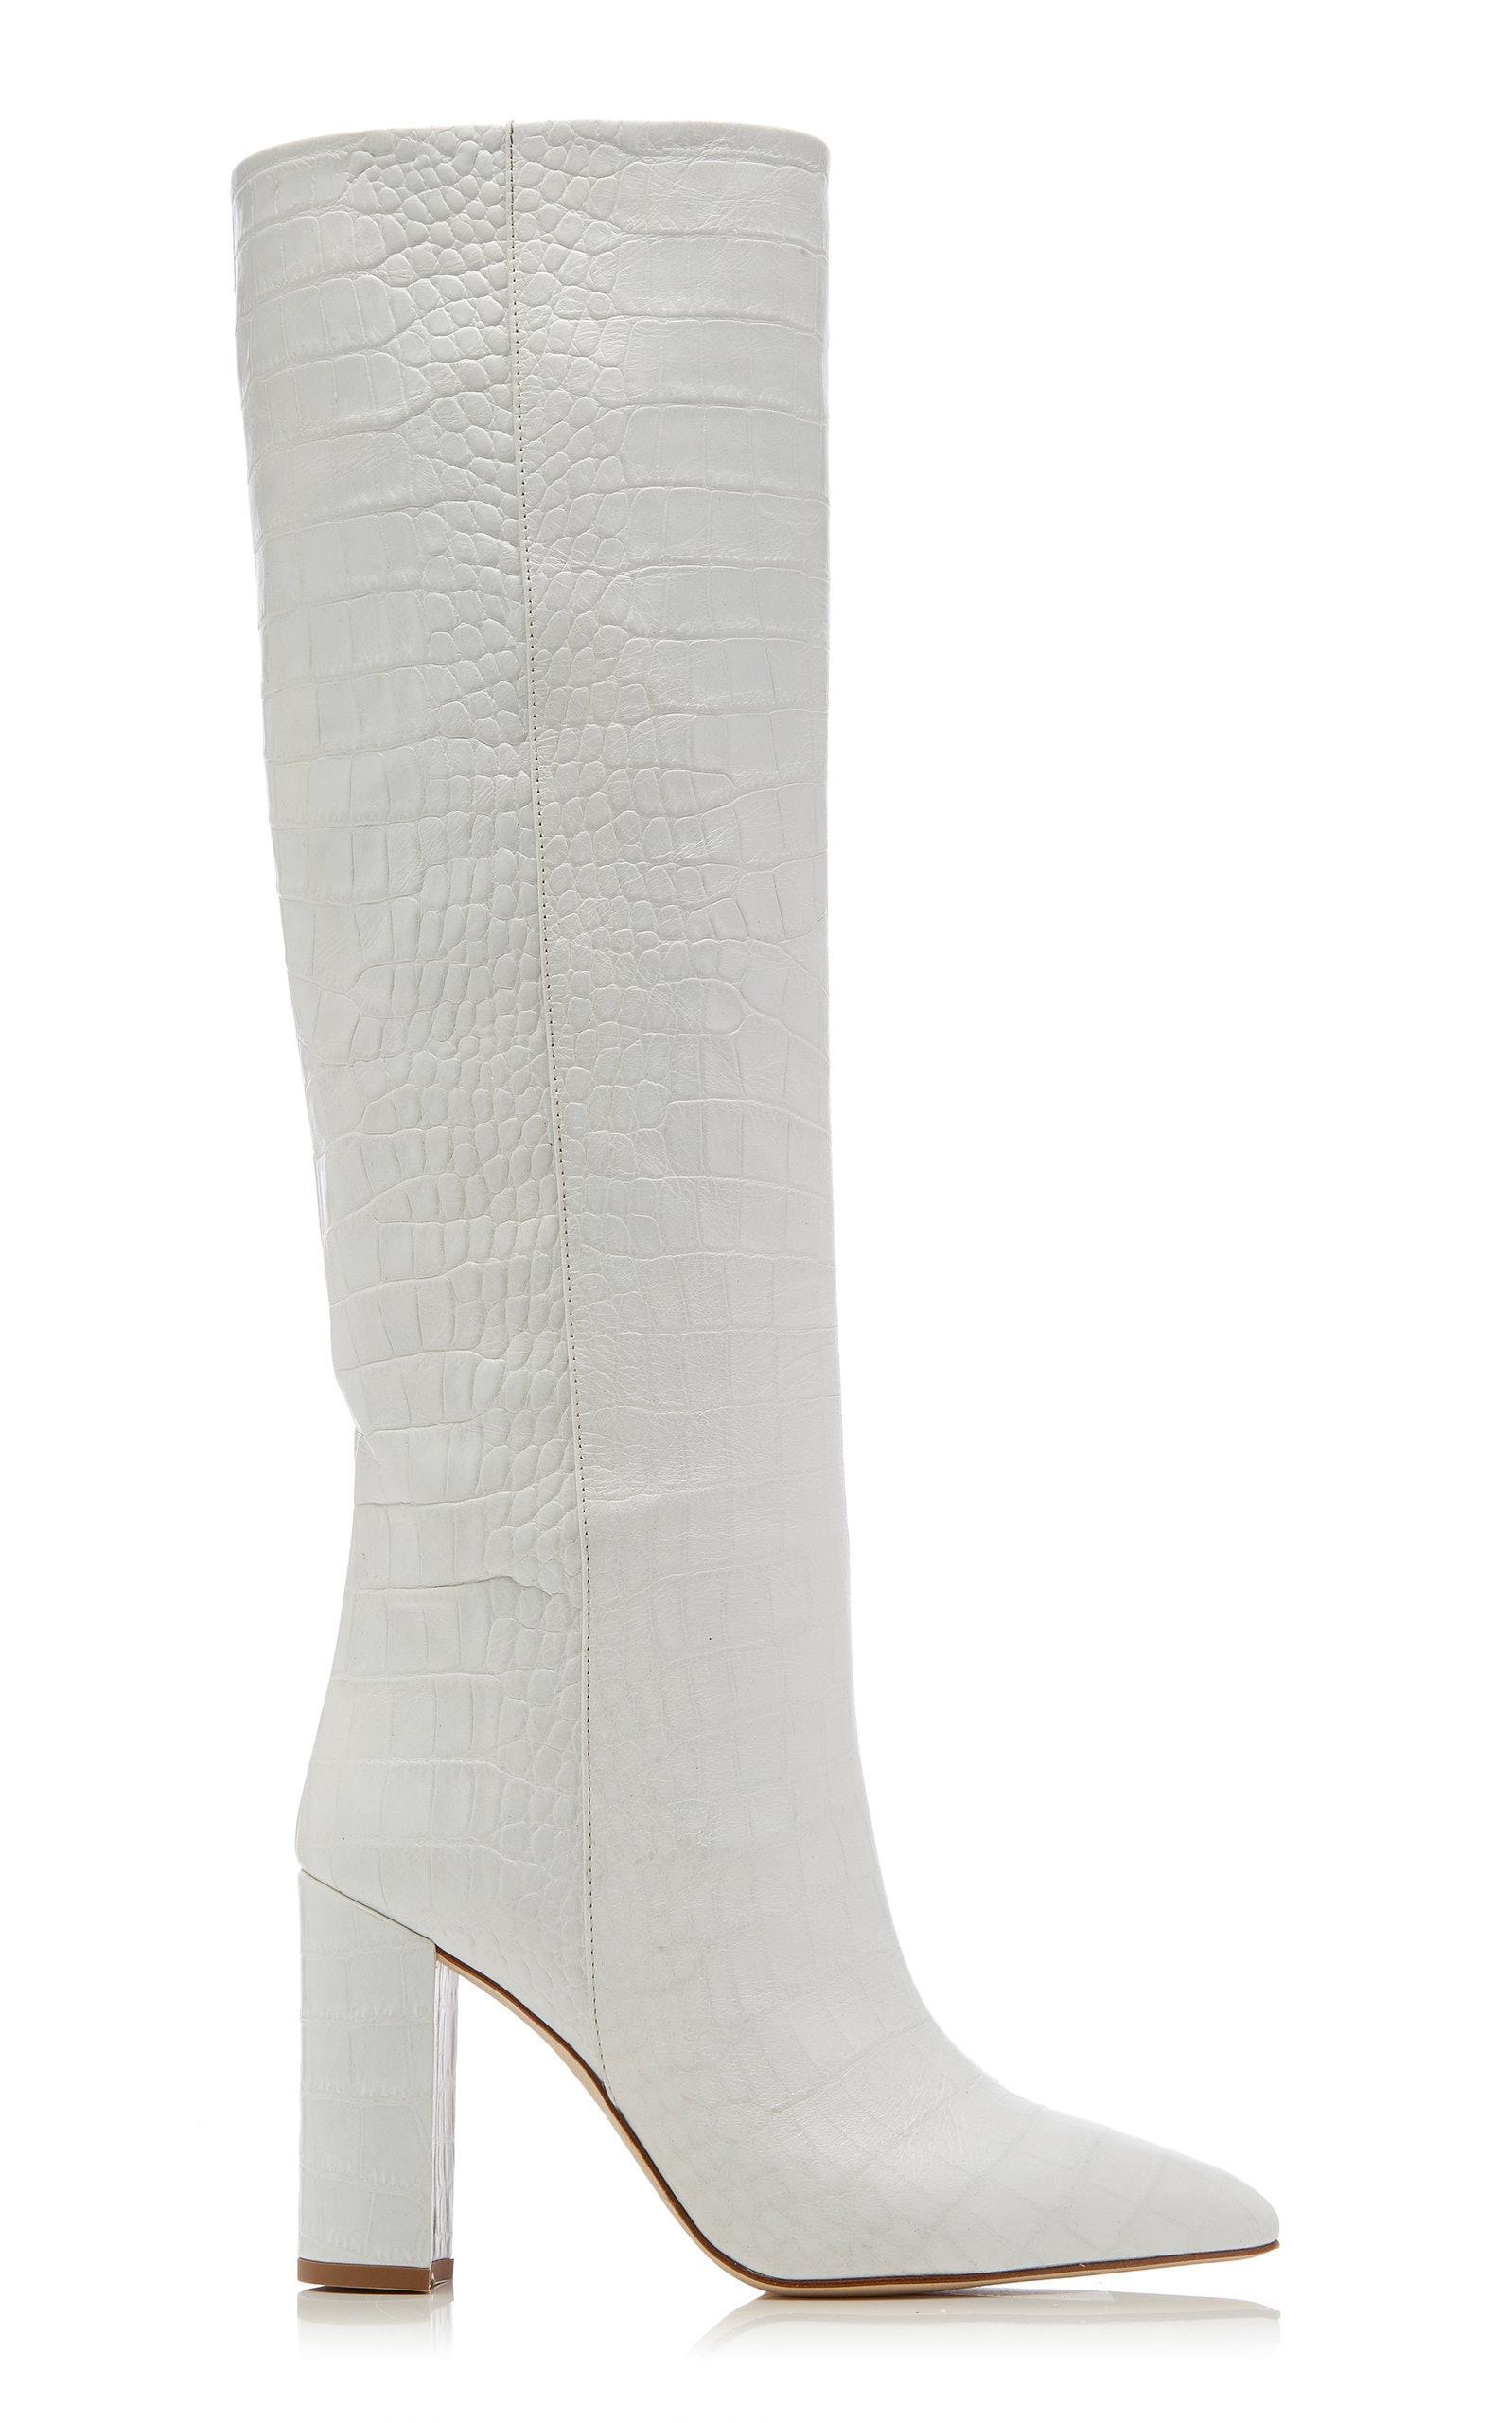 Fall's White Knee-High Boot Trend